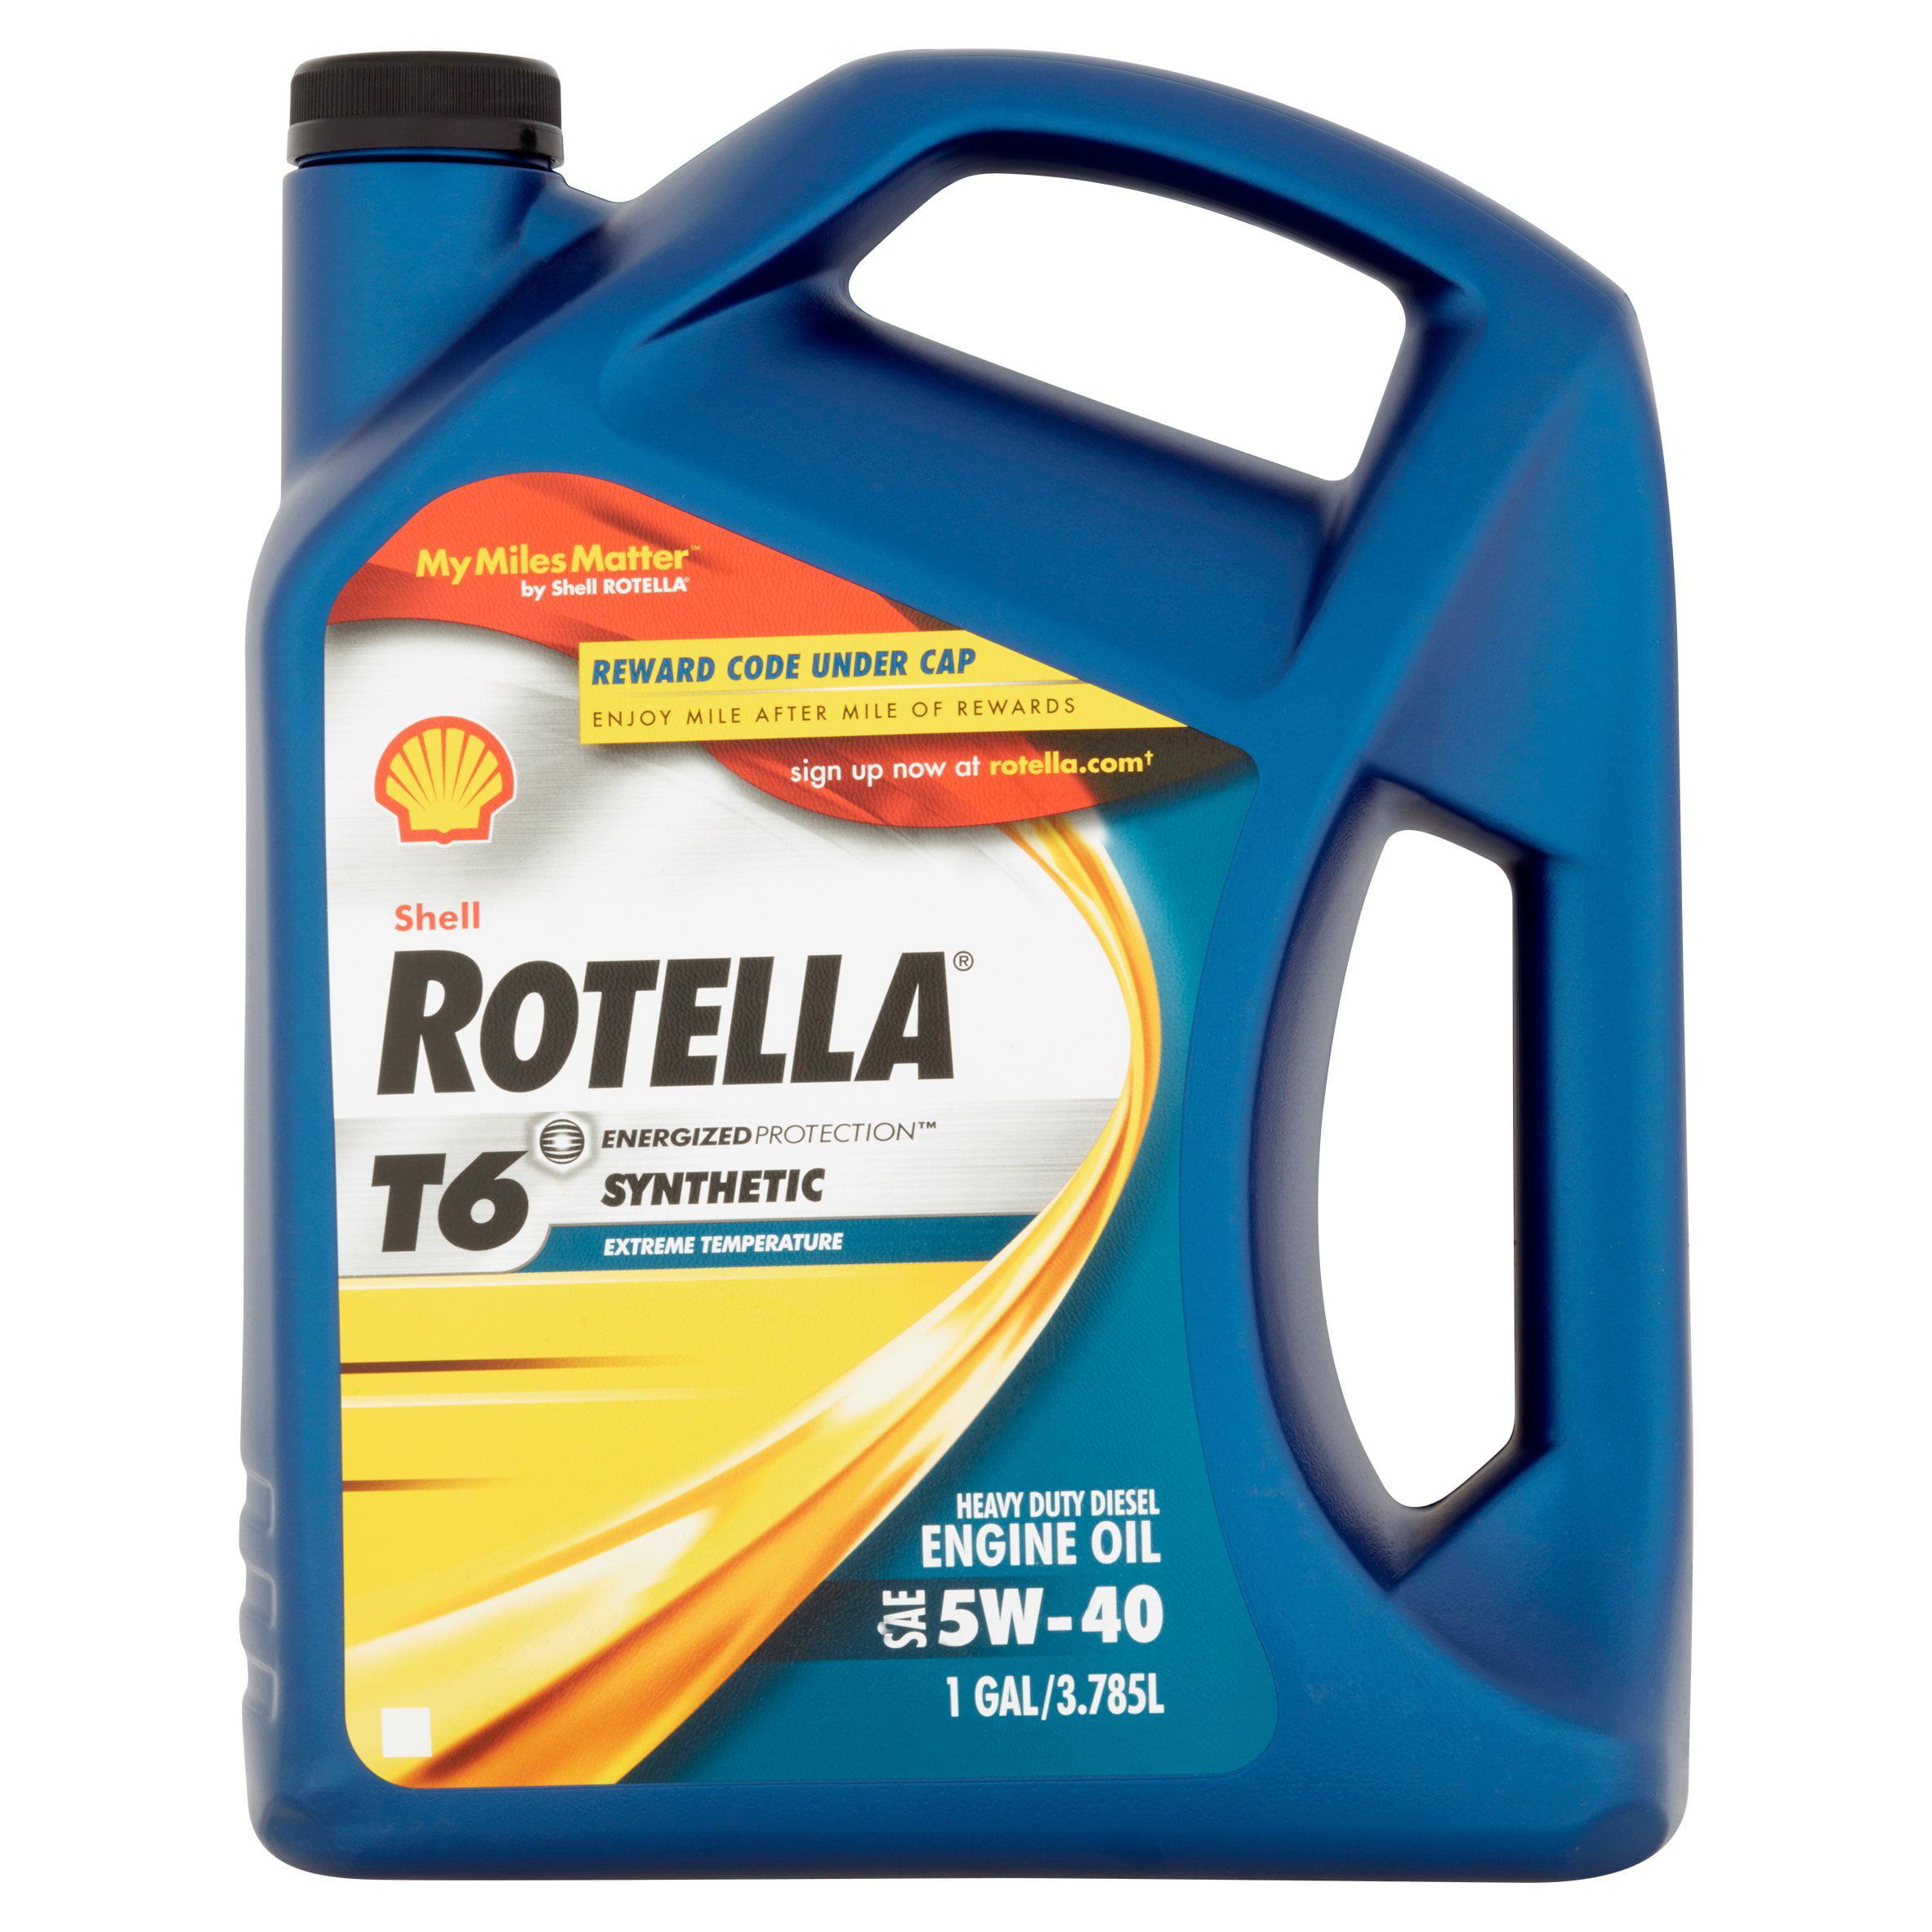 Shell Rotella Synthetic 5w 40 Motor Oil 1 Gallon